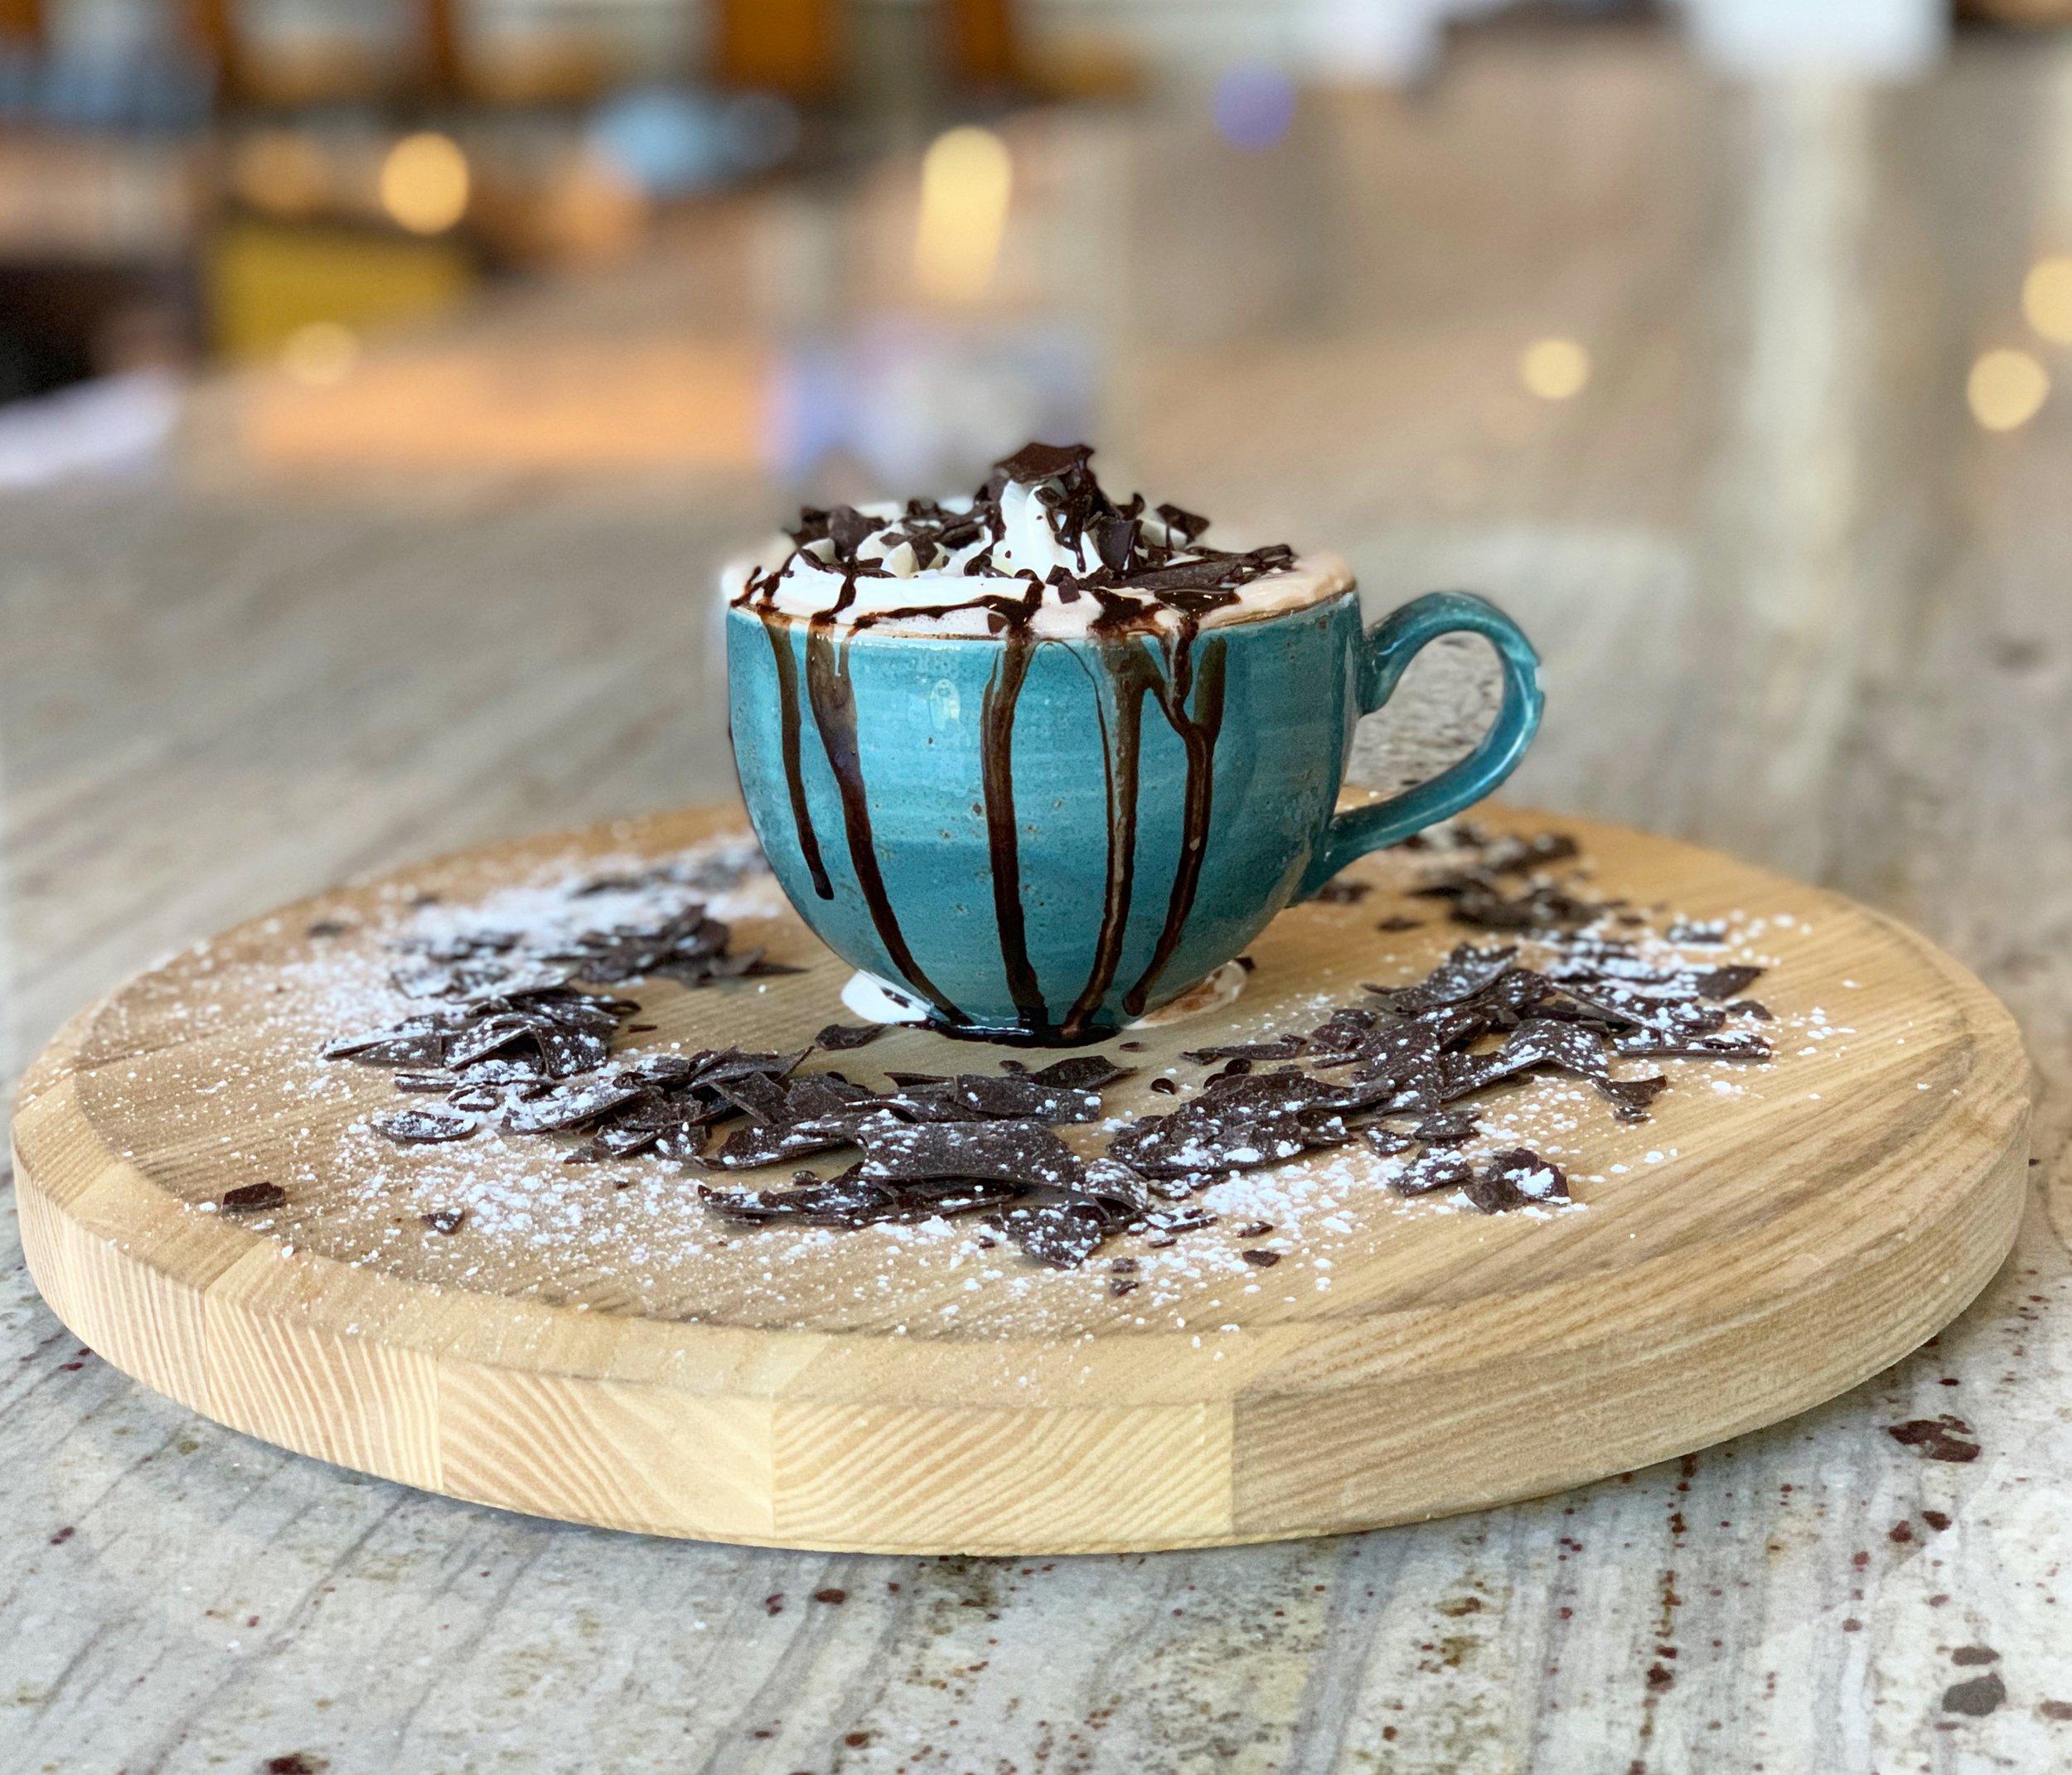 Chinook Winds Hot Chocolate -